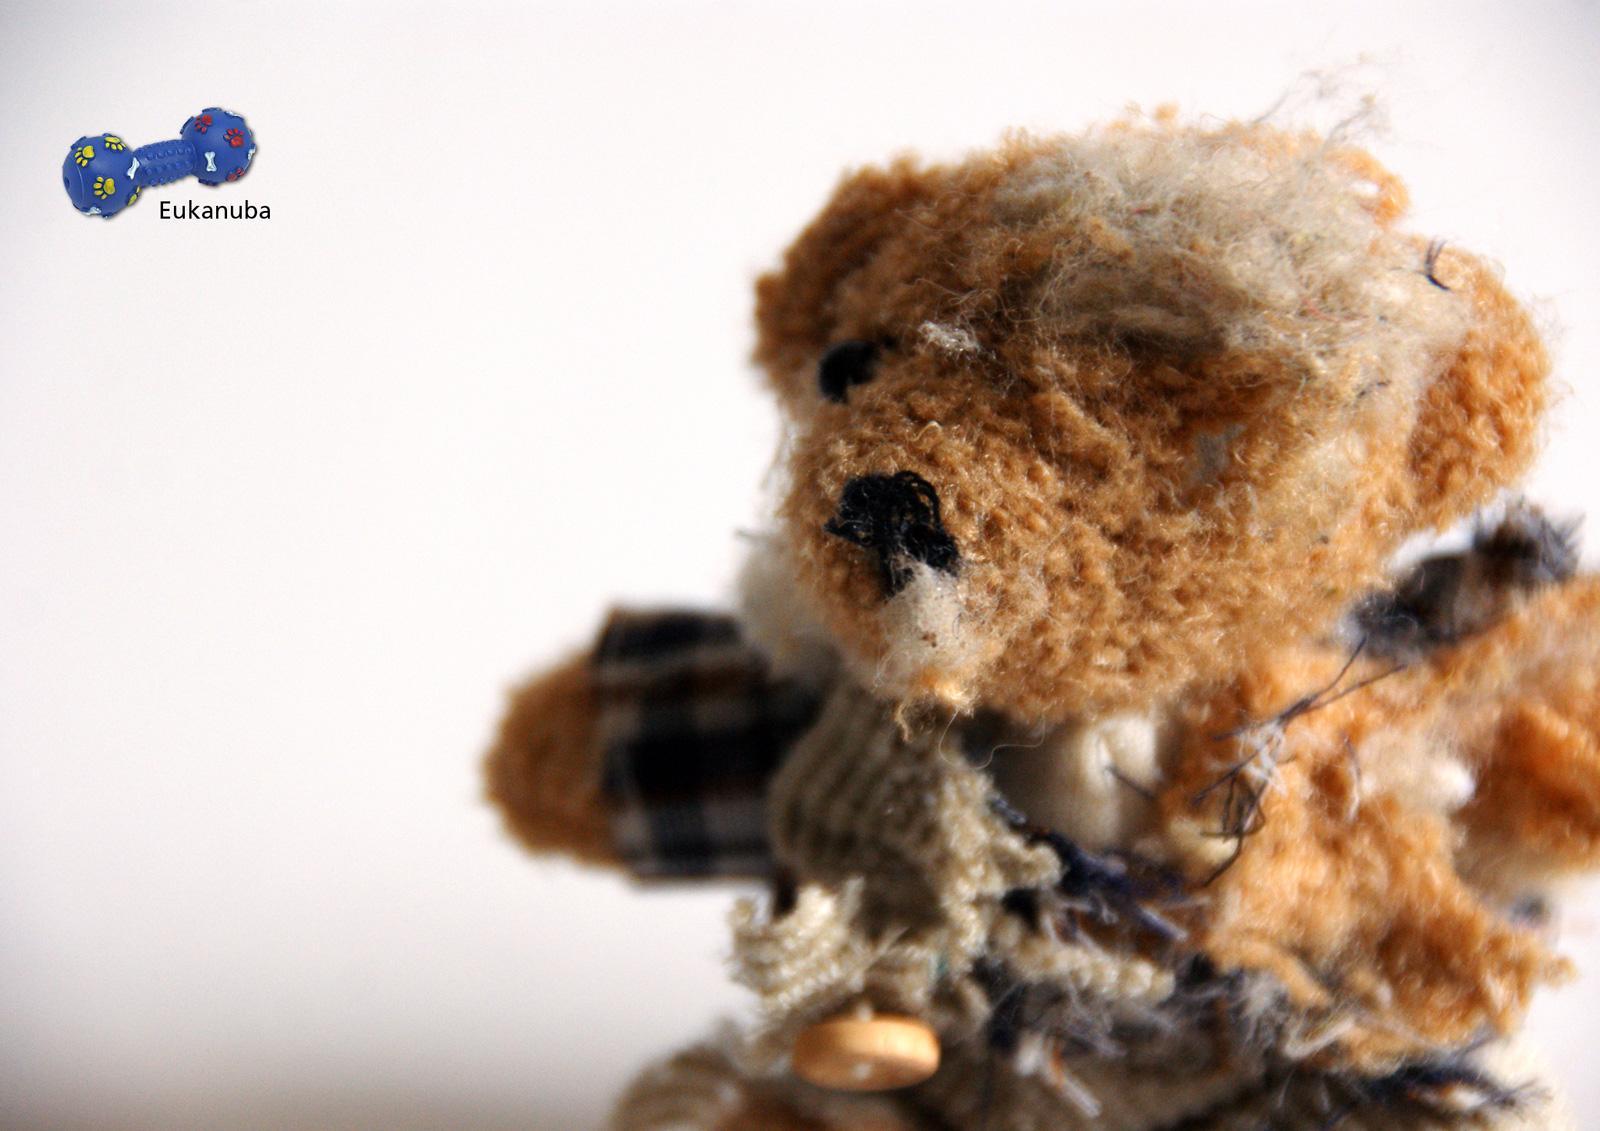 Eukanuba Print Ad -  Teddy Bear